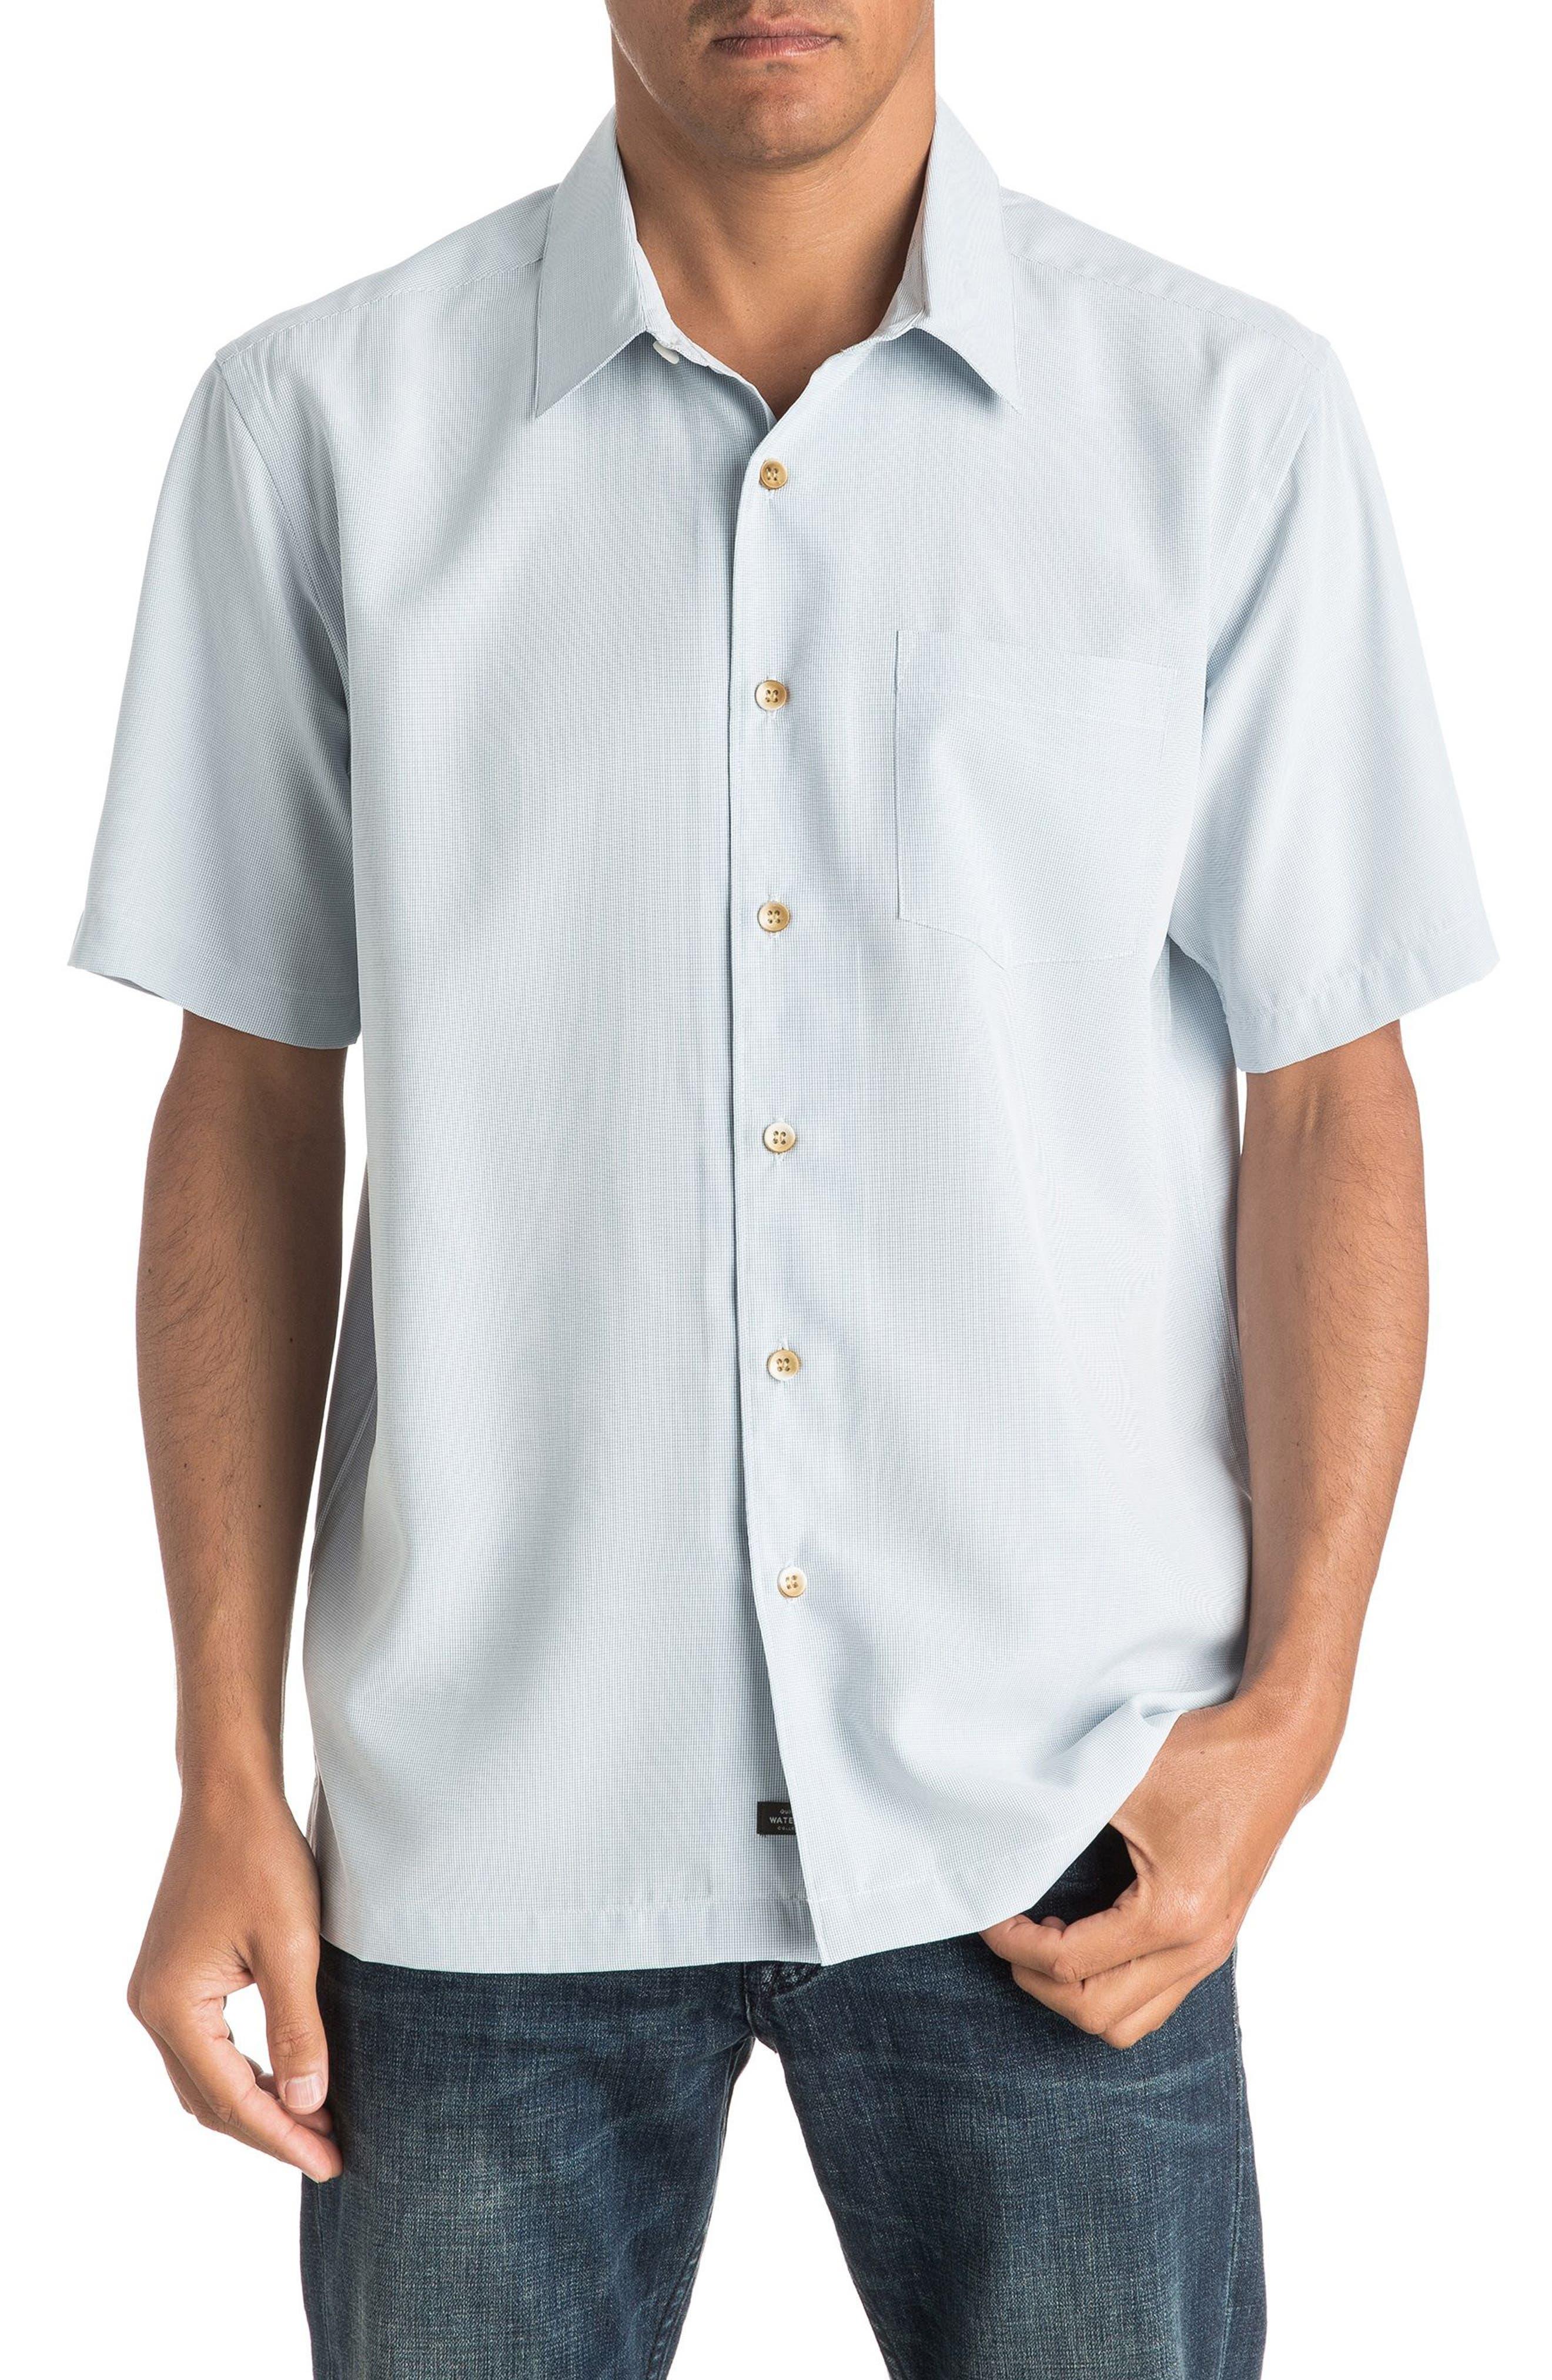 Quiksilver Waterman Collection 'Cane Island' Regular Fit Short Sleeve Sport Shirt